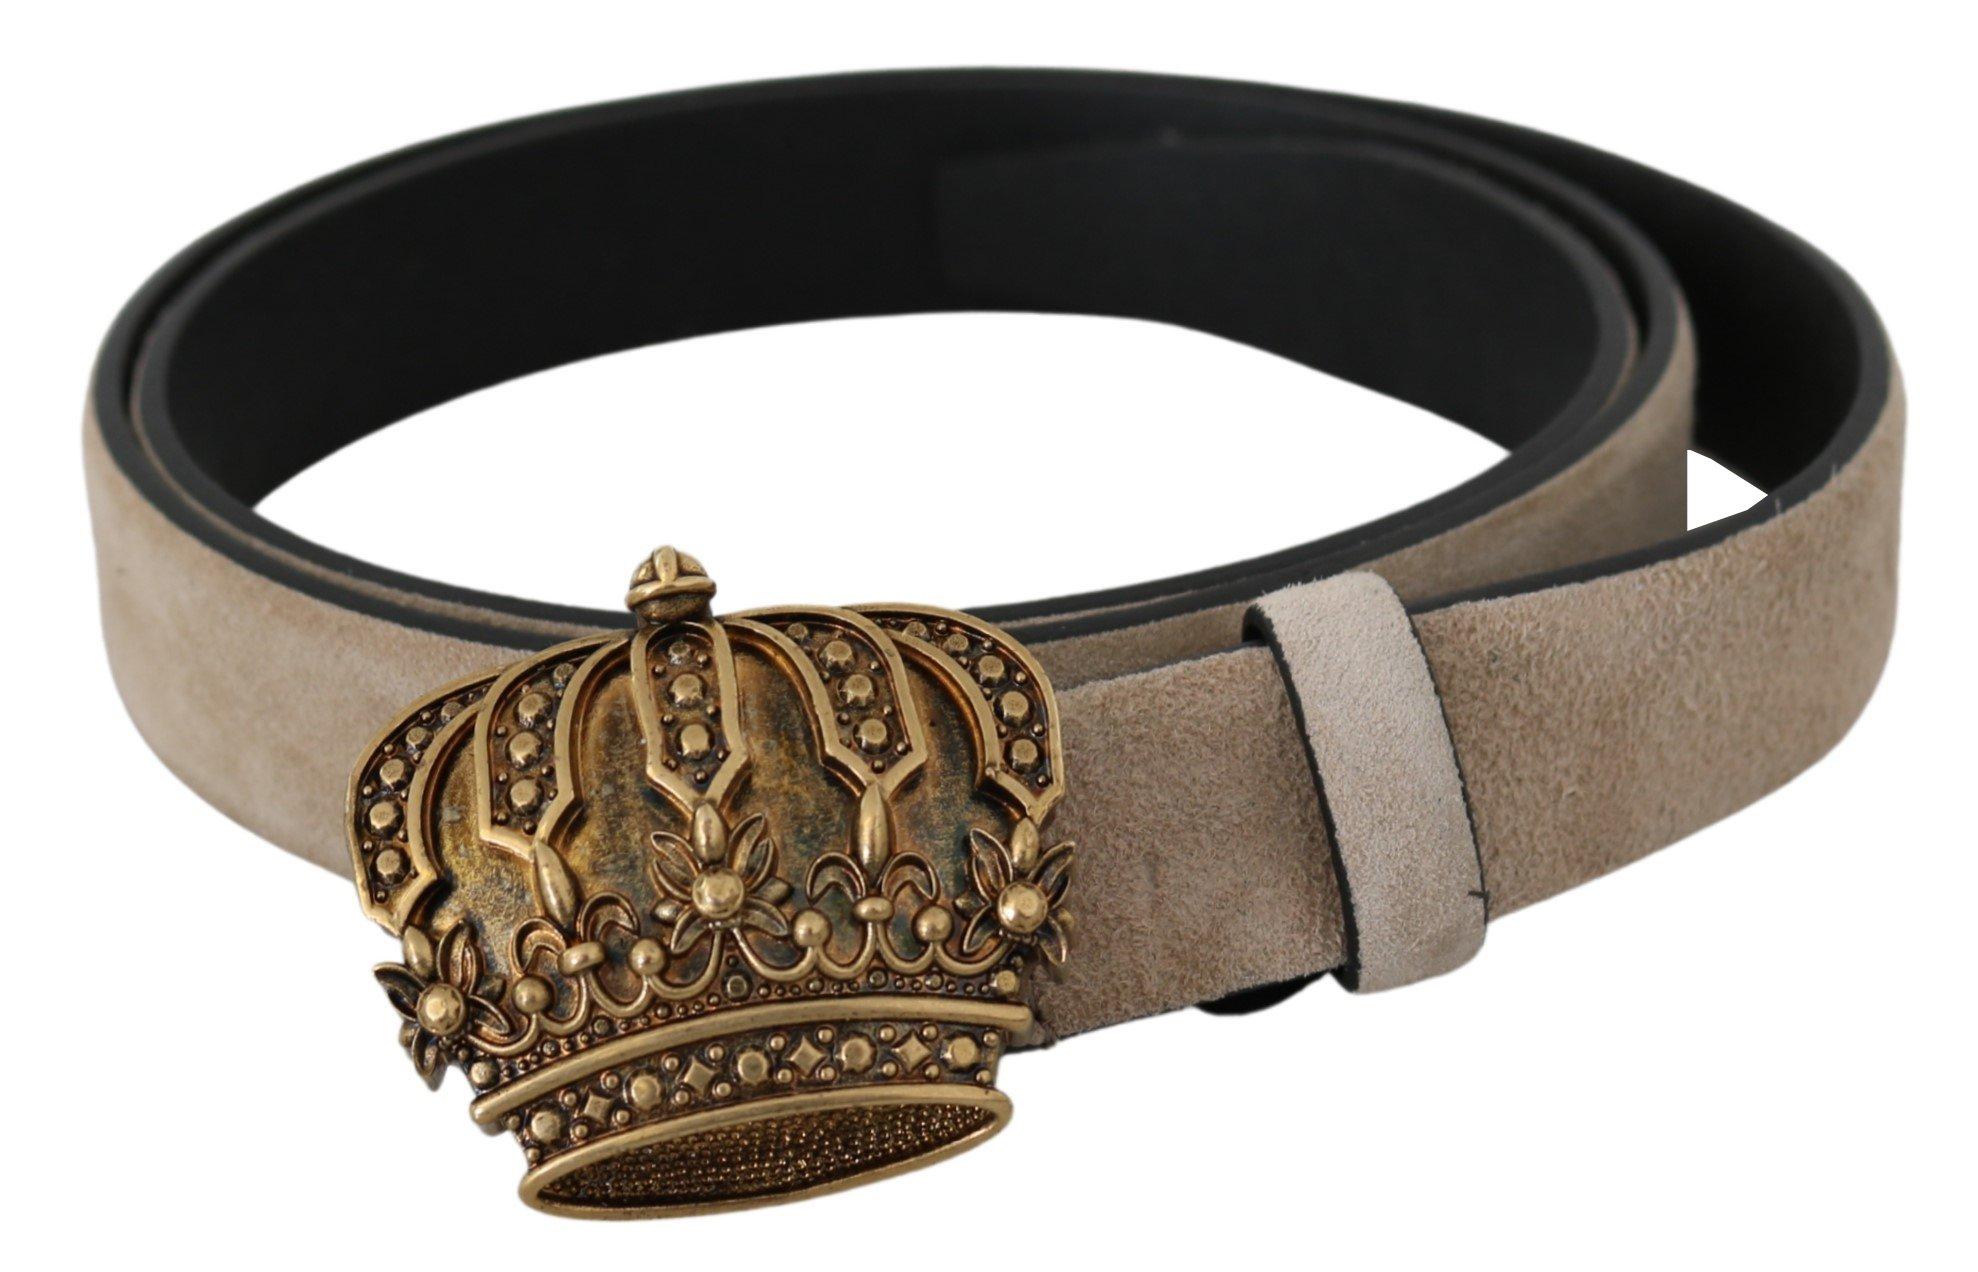 Dolce & Gabbana Women's Leather Gold Crown Belt Beige \BEL60790-90 - 90 cm / 36 Inches